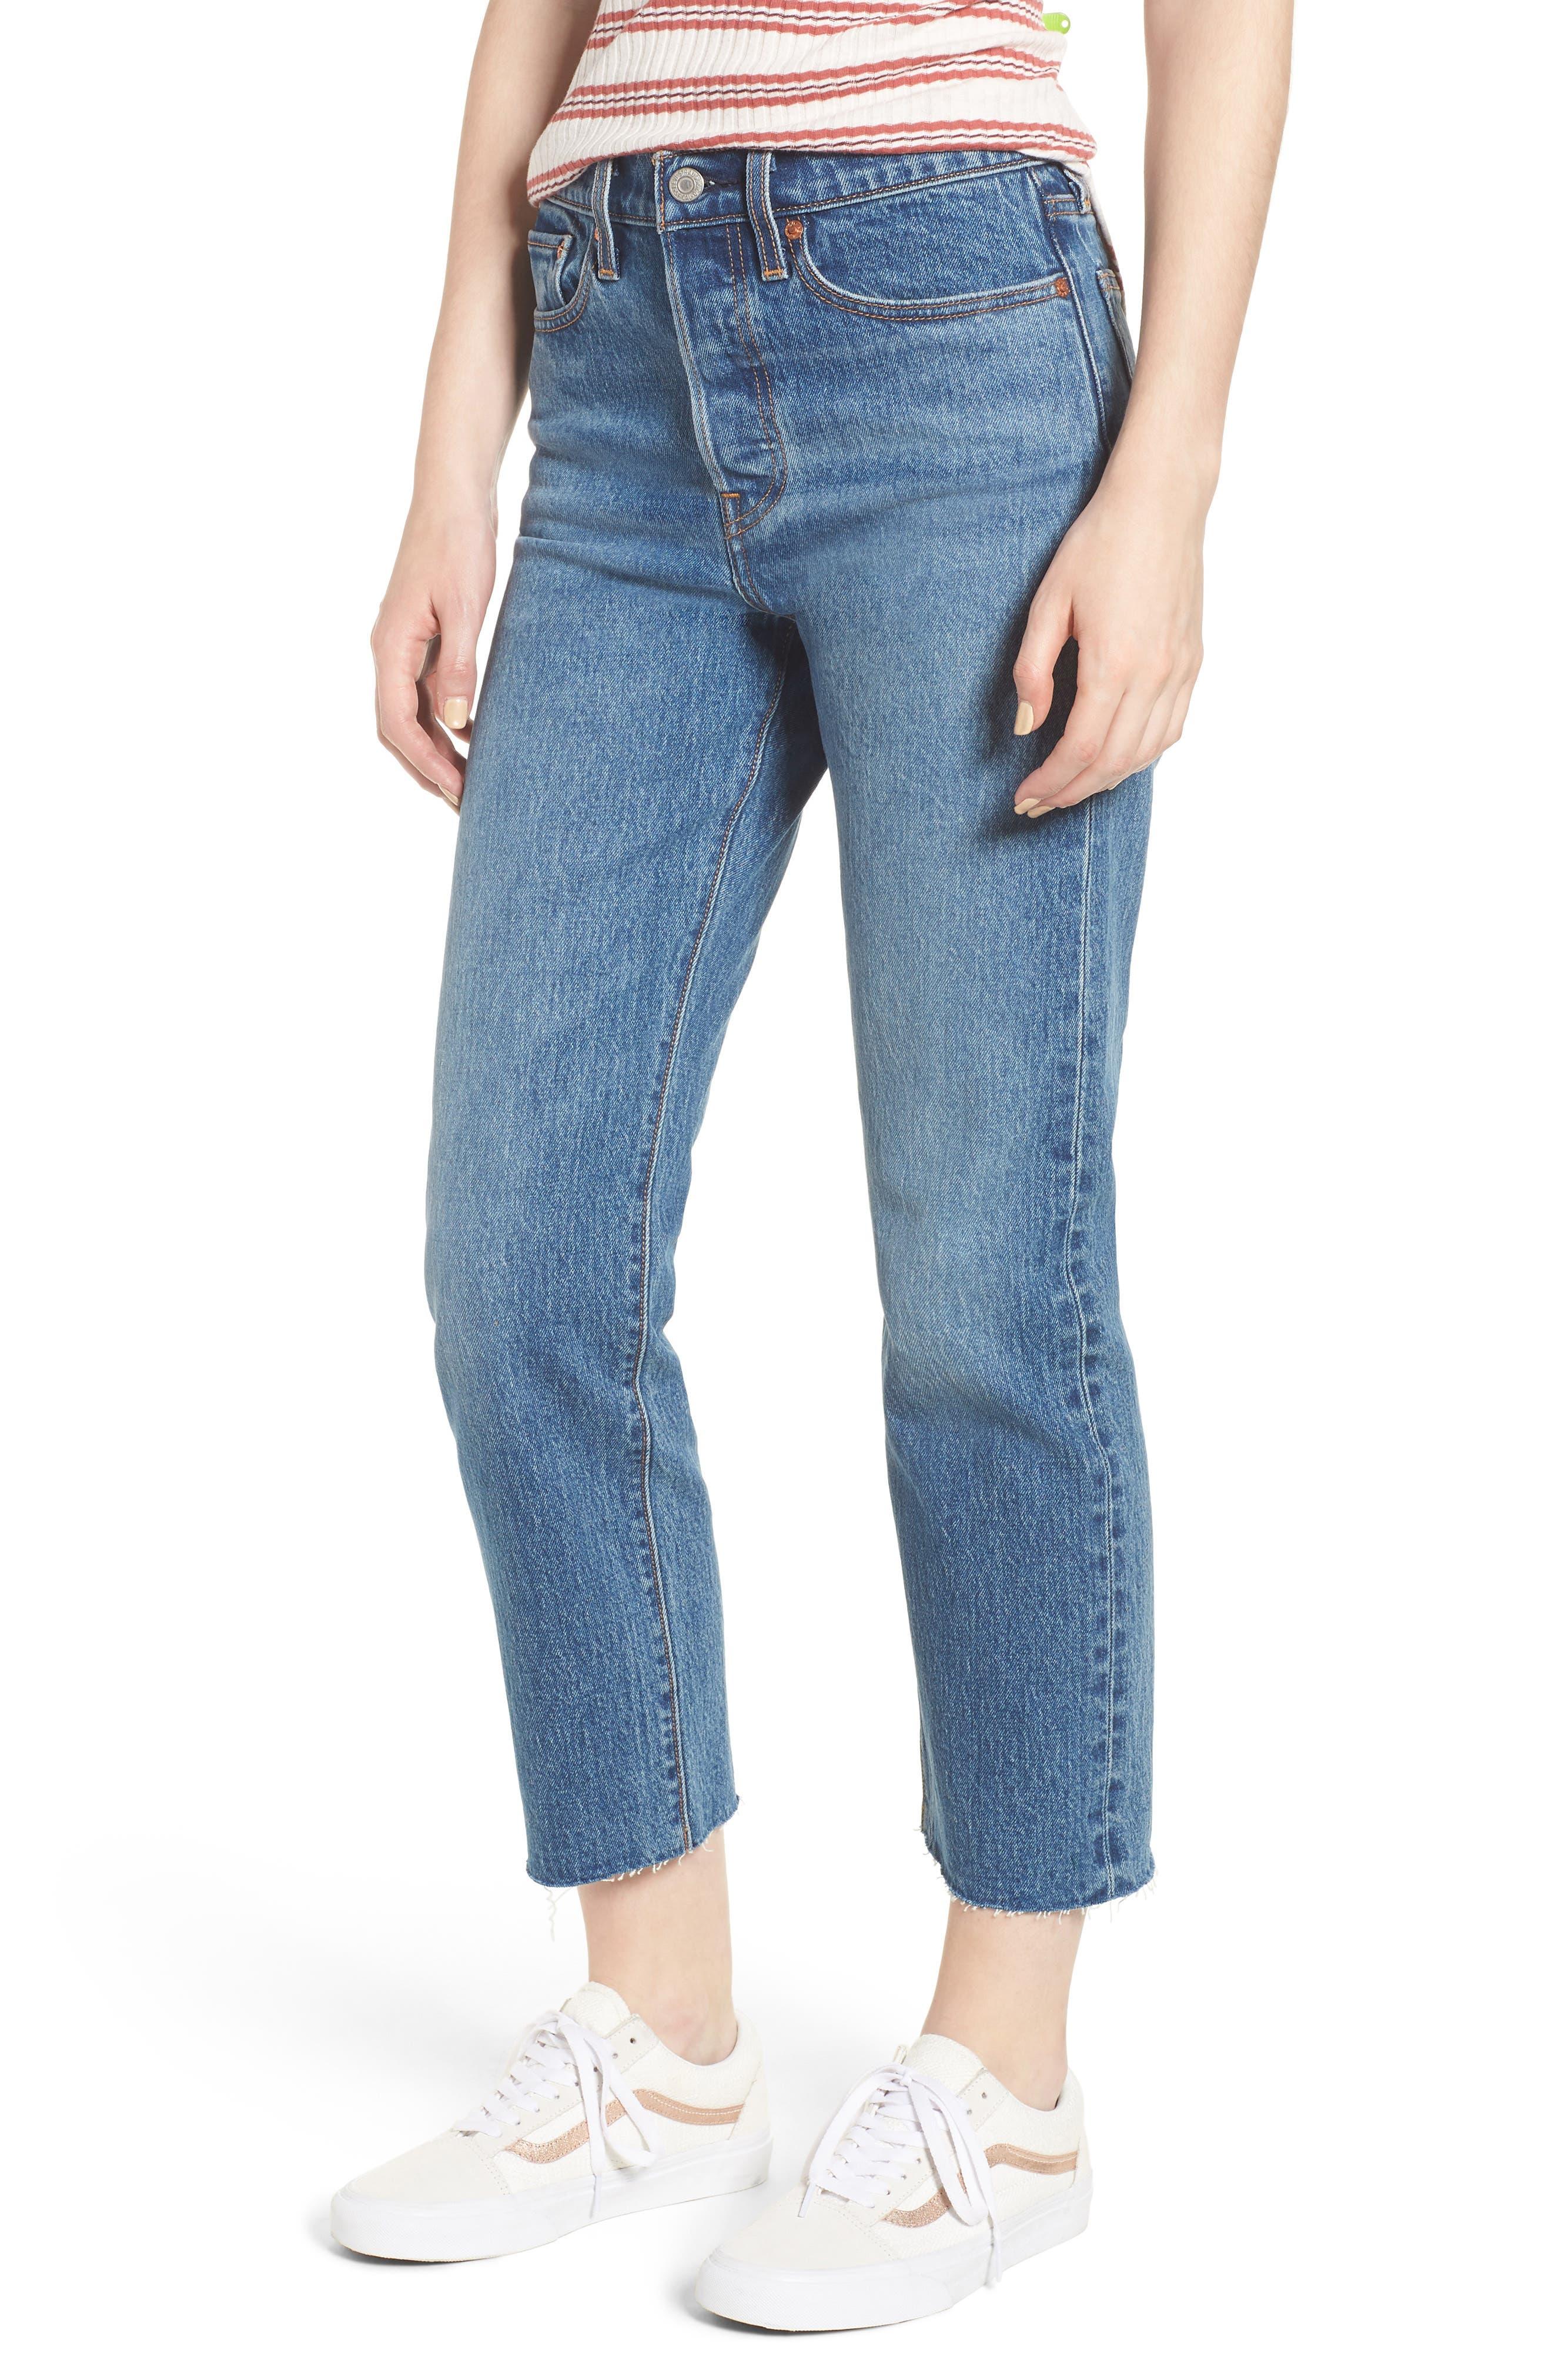 LEVI'S<SUP>®</SUP>, Wedgie Raw Hem High Waist Straight Leg Jeans, Main thumbnail 1, color, LOVE TRIANGLE